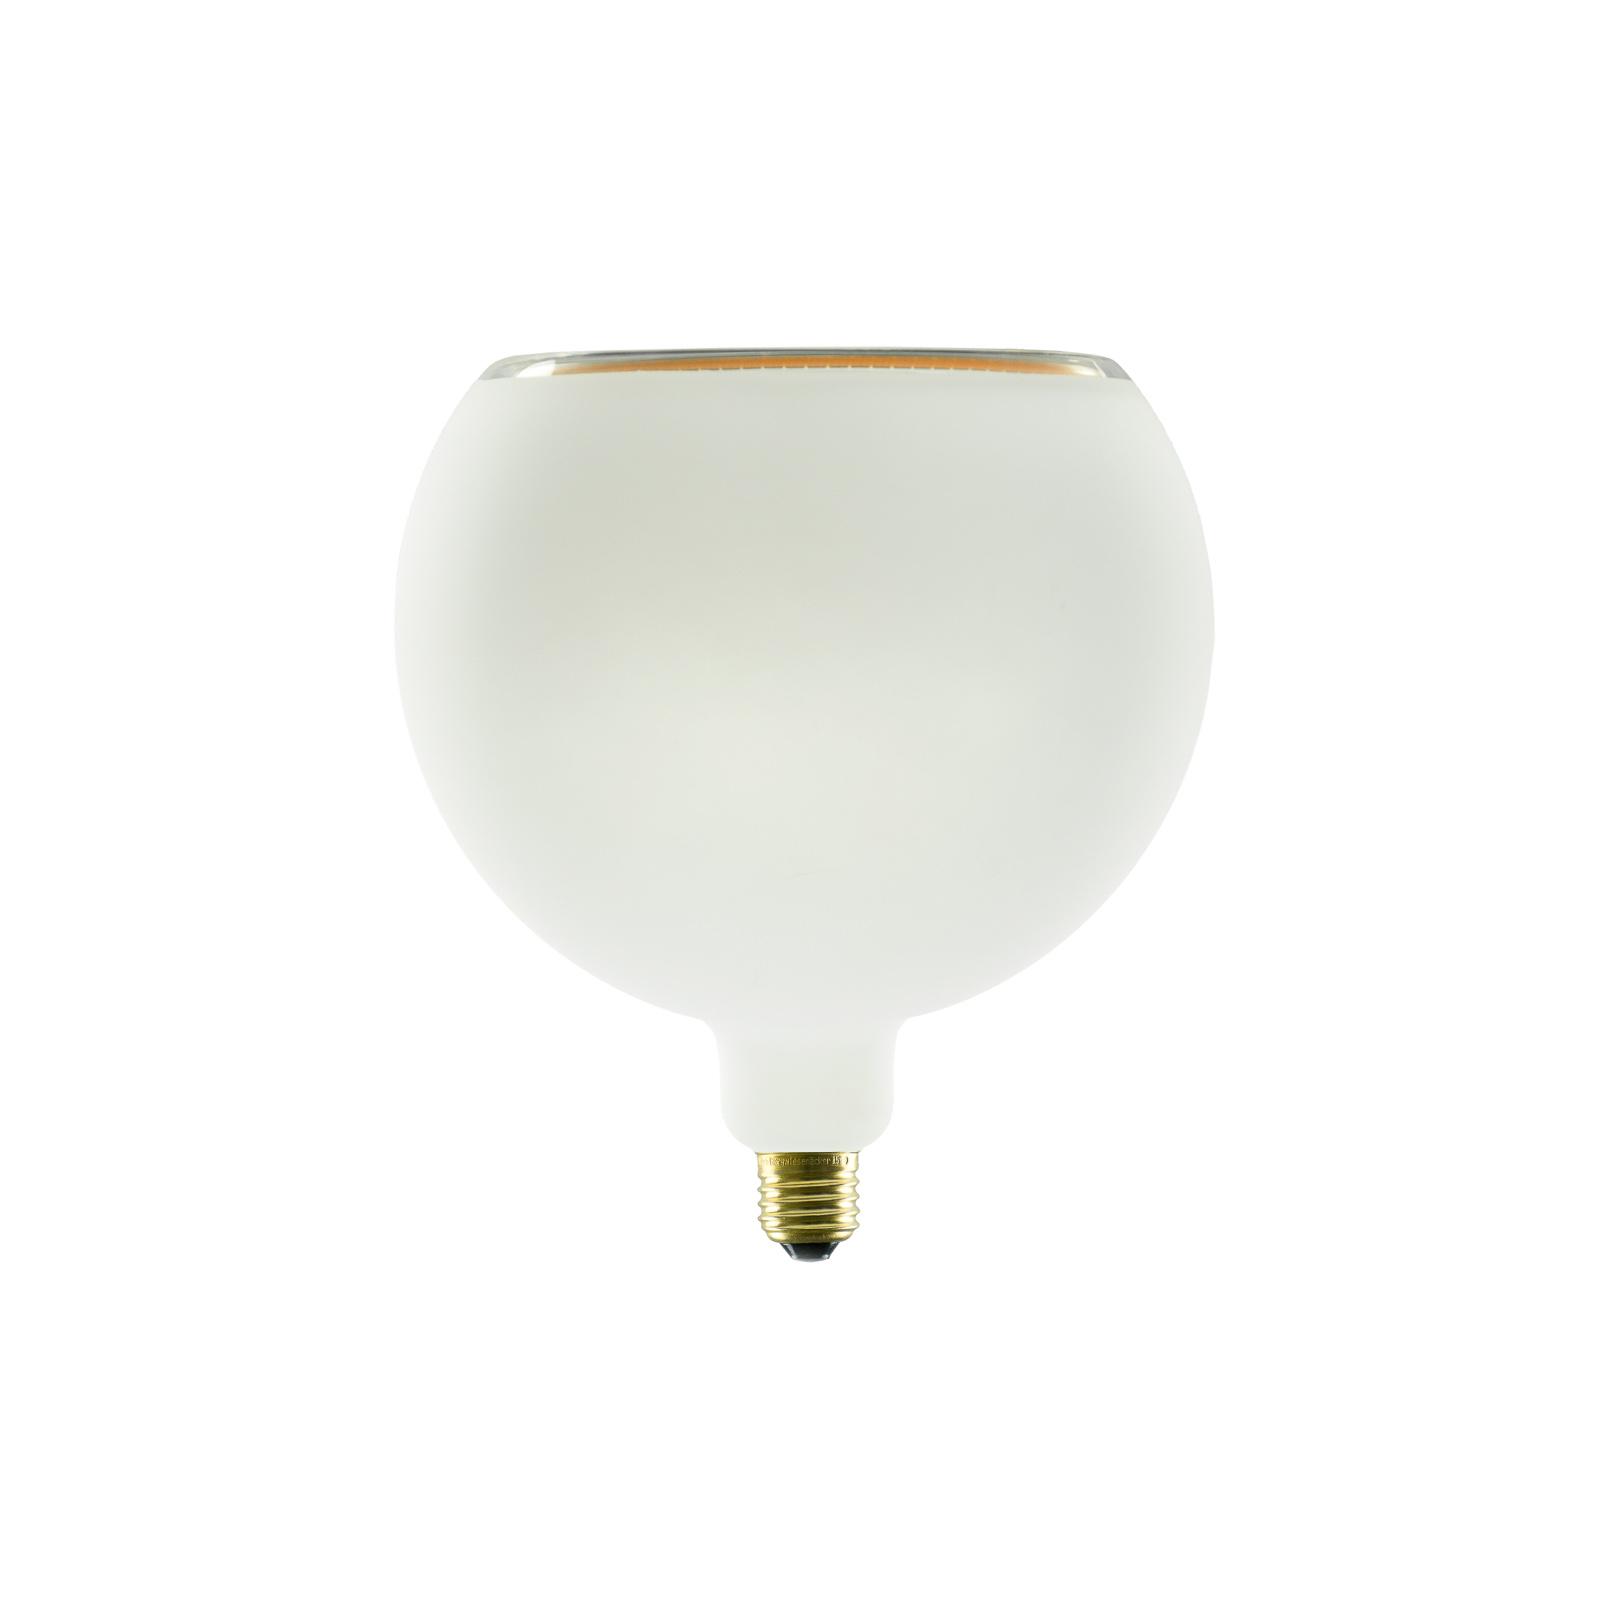 SEGULA LED Floating-Globelampe 200 E27 8W opal